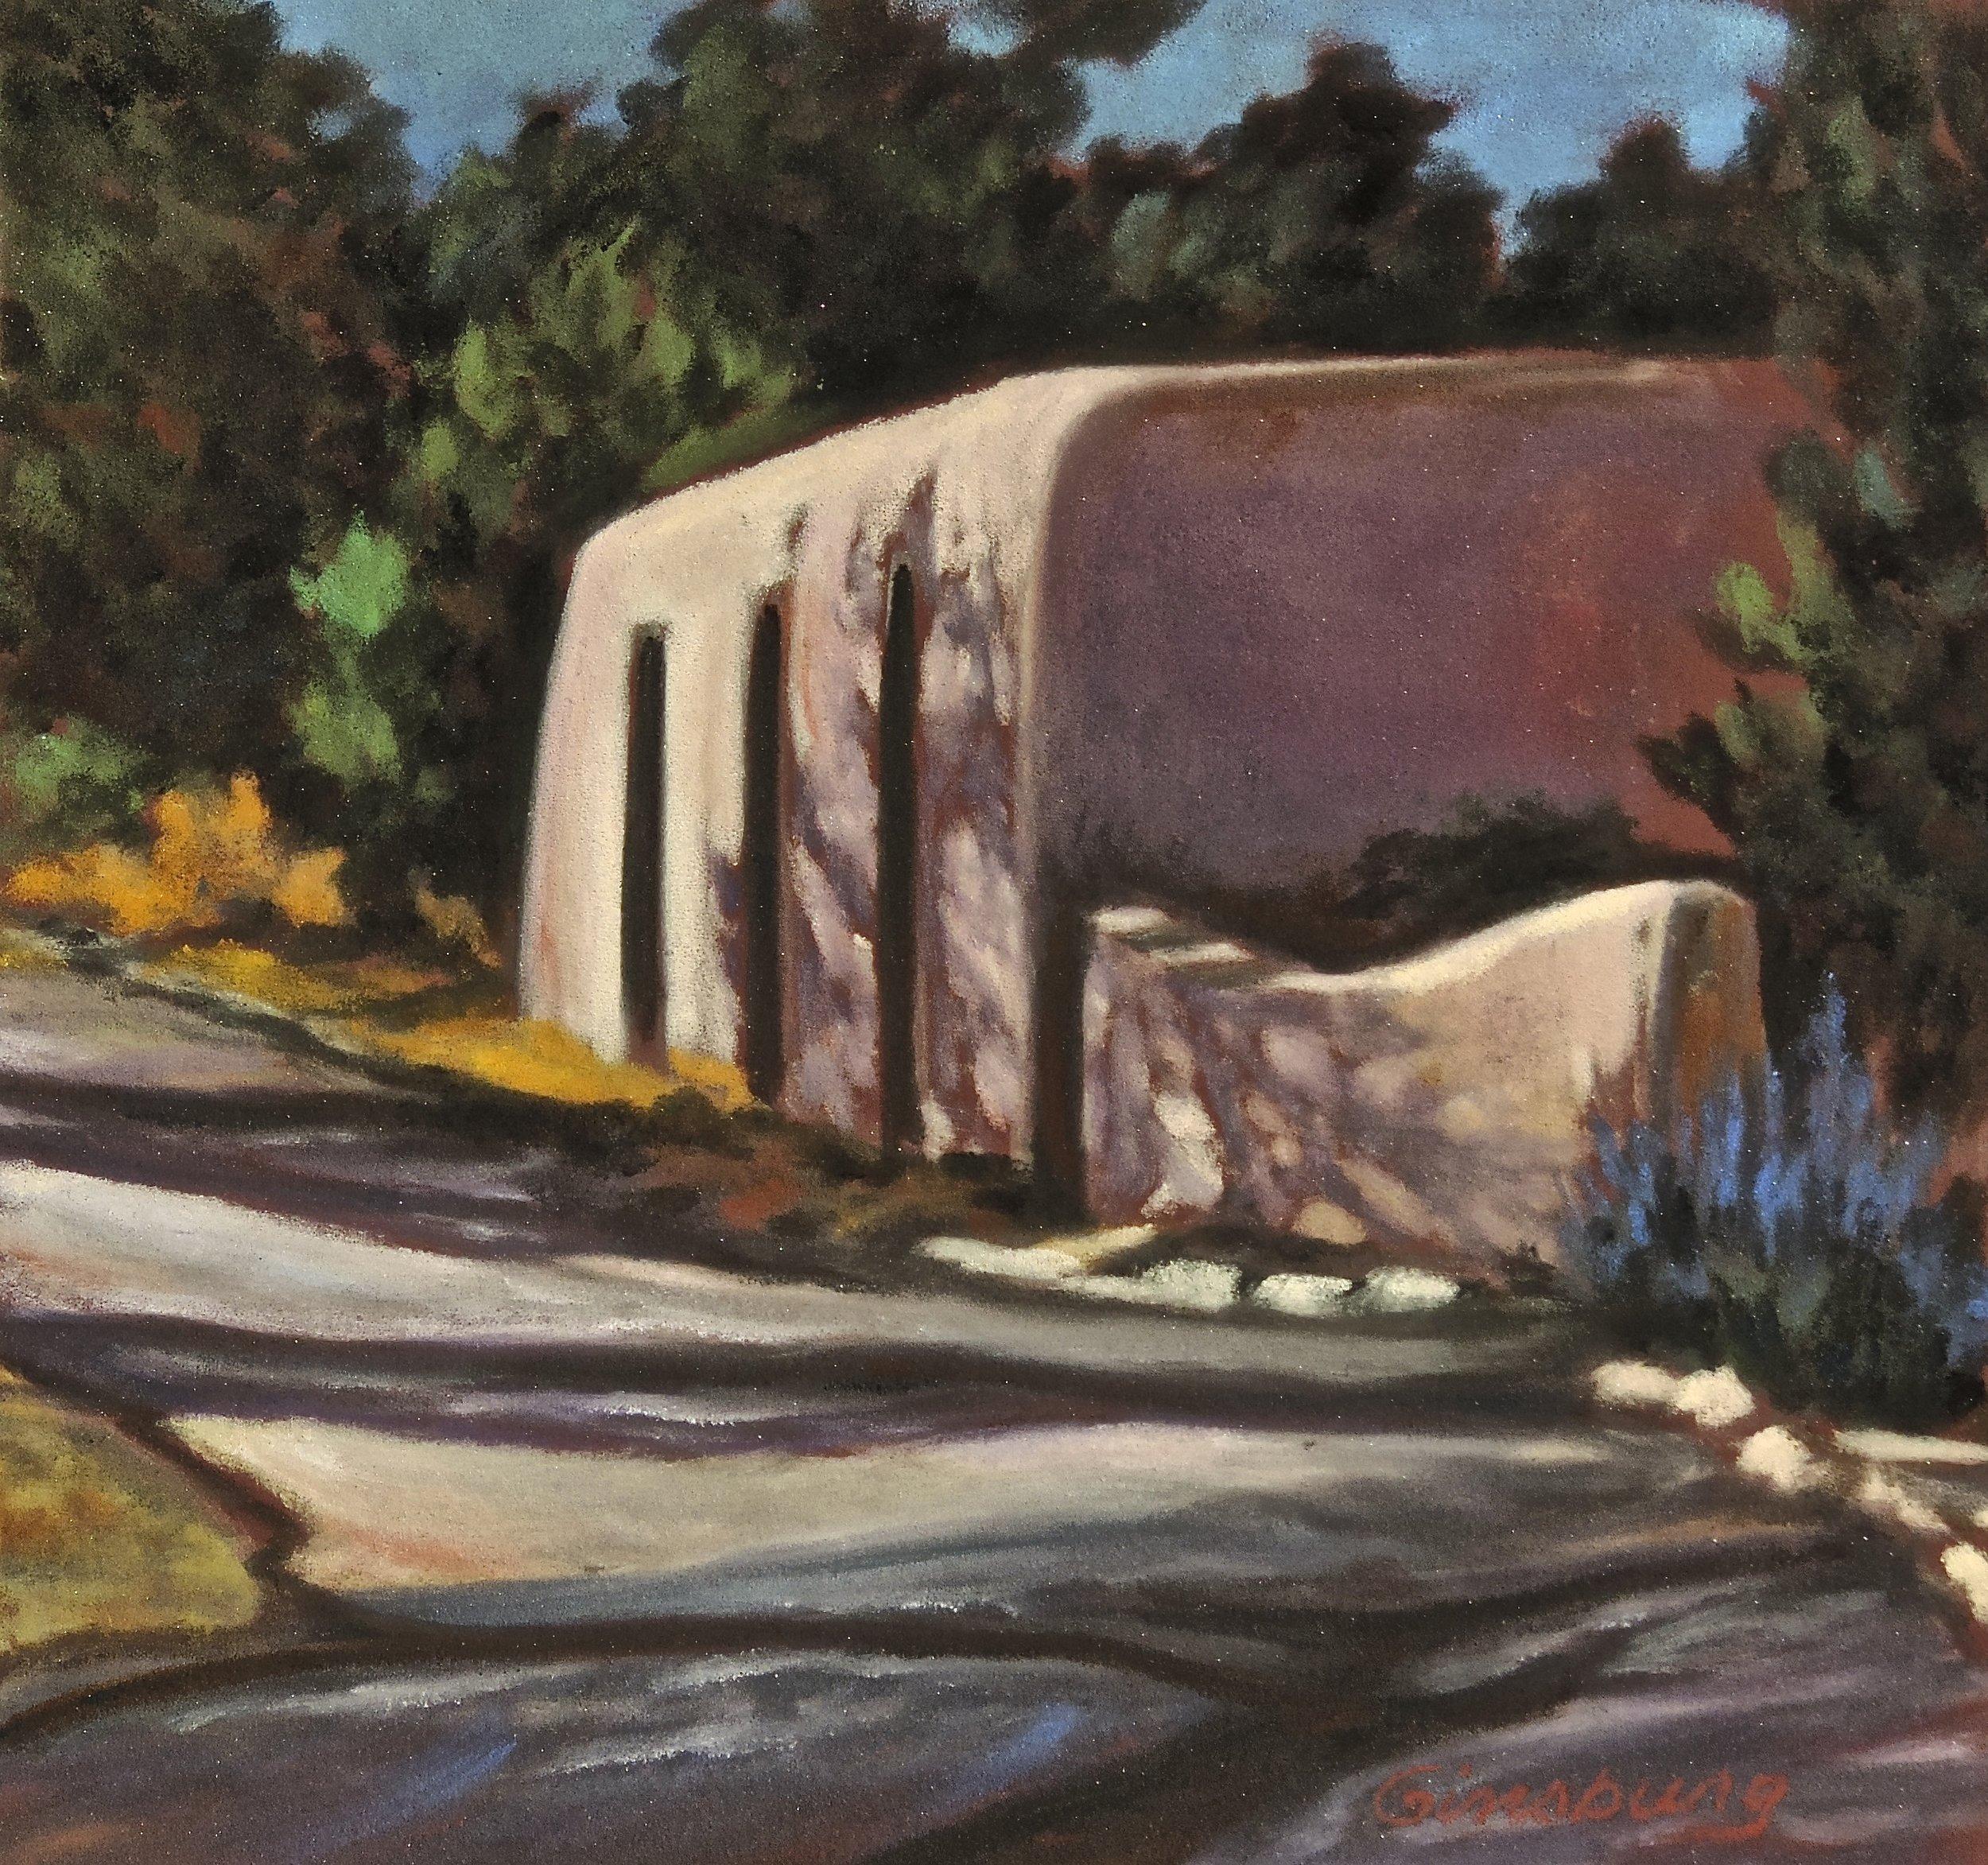 """LAMY HOME"", LAMY, New Mexico  Pan Pastel® Cheri GInsburg ©"